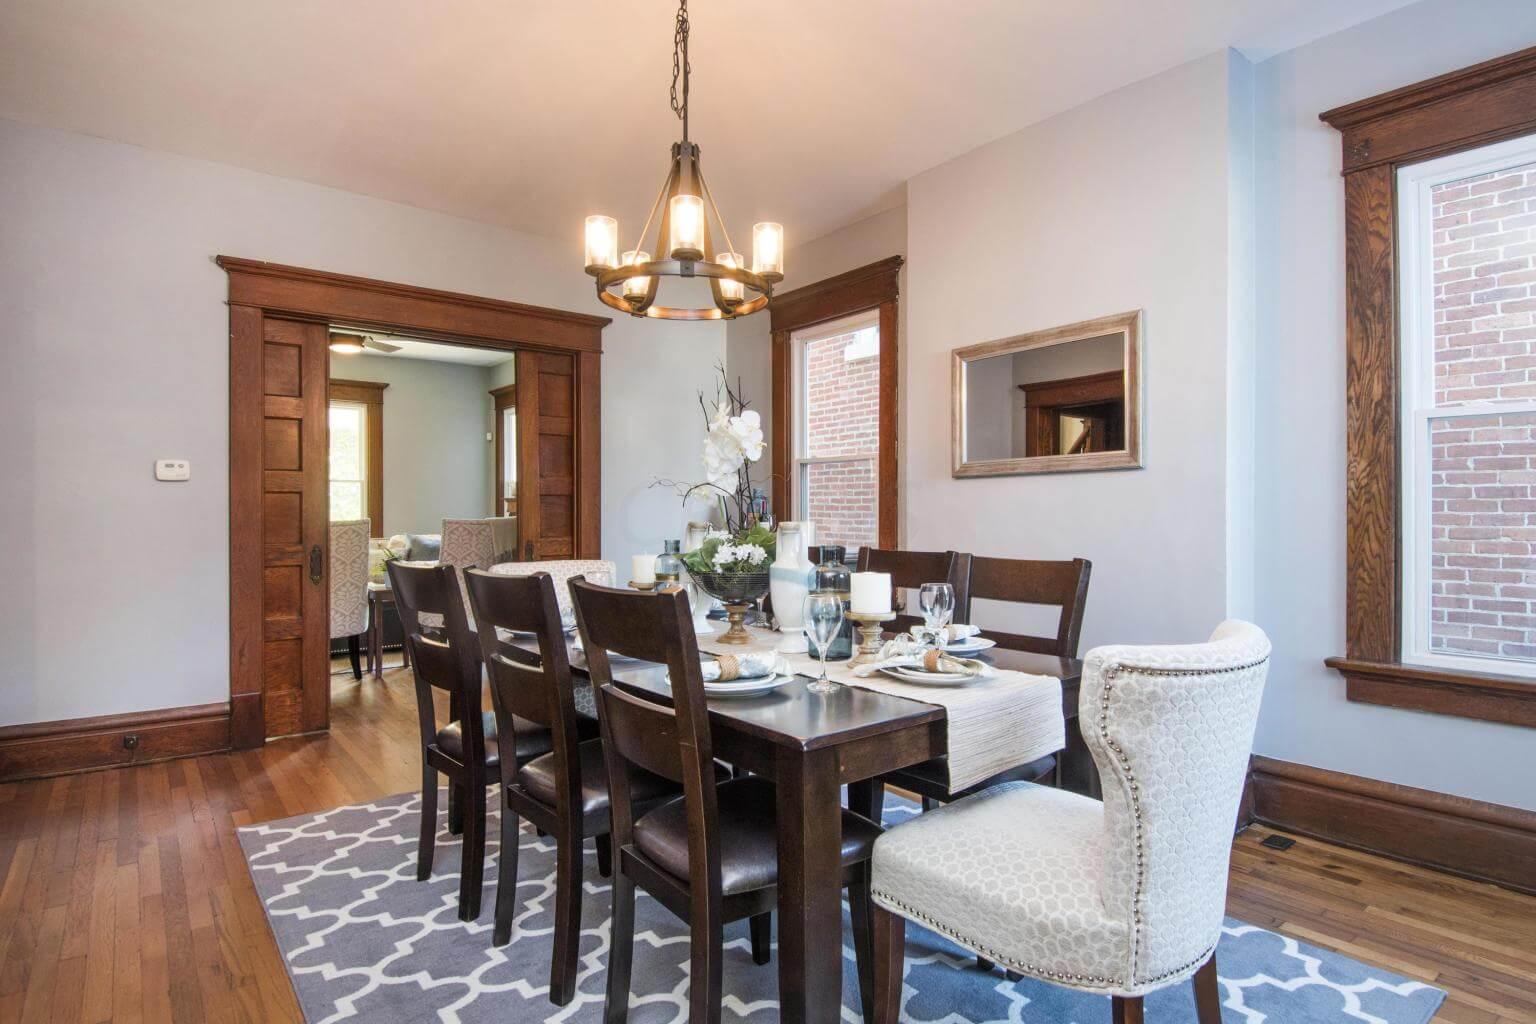 1372 Eastwood Ave. Columbus Ohio – BluePrint Investments, LLC